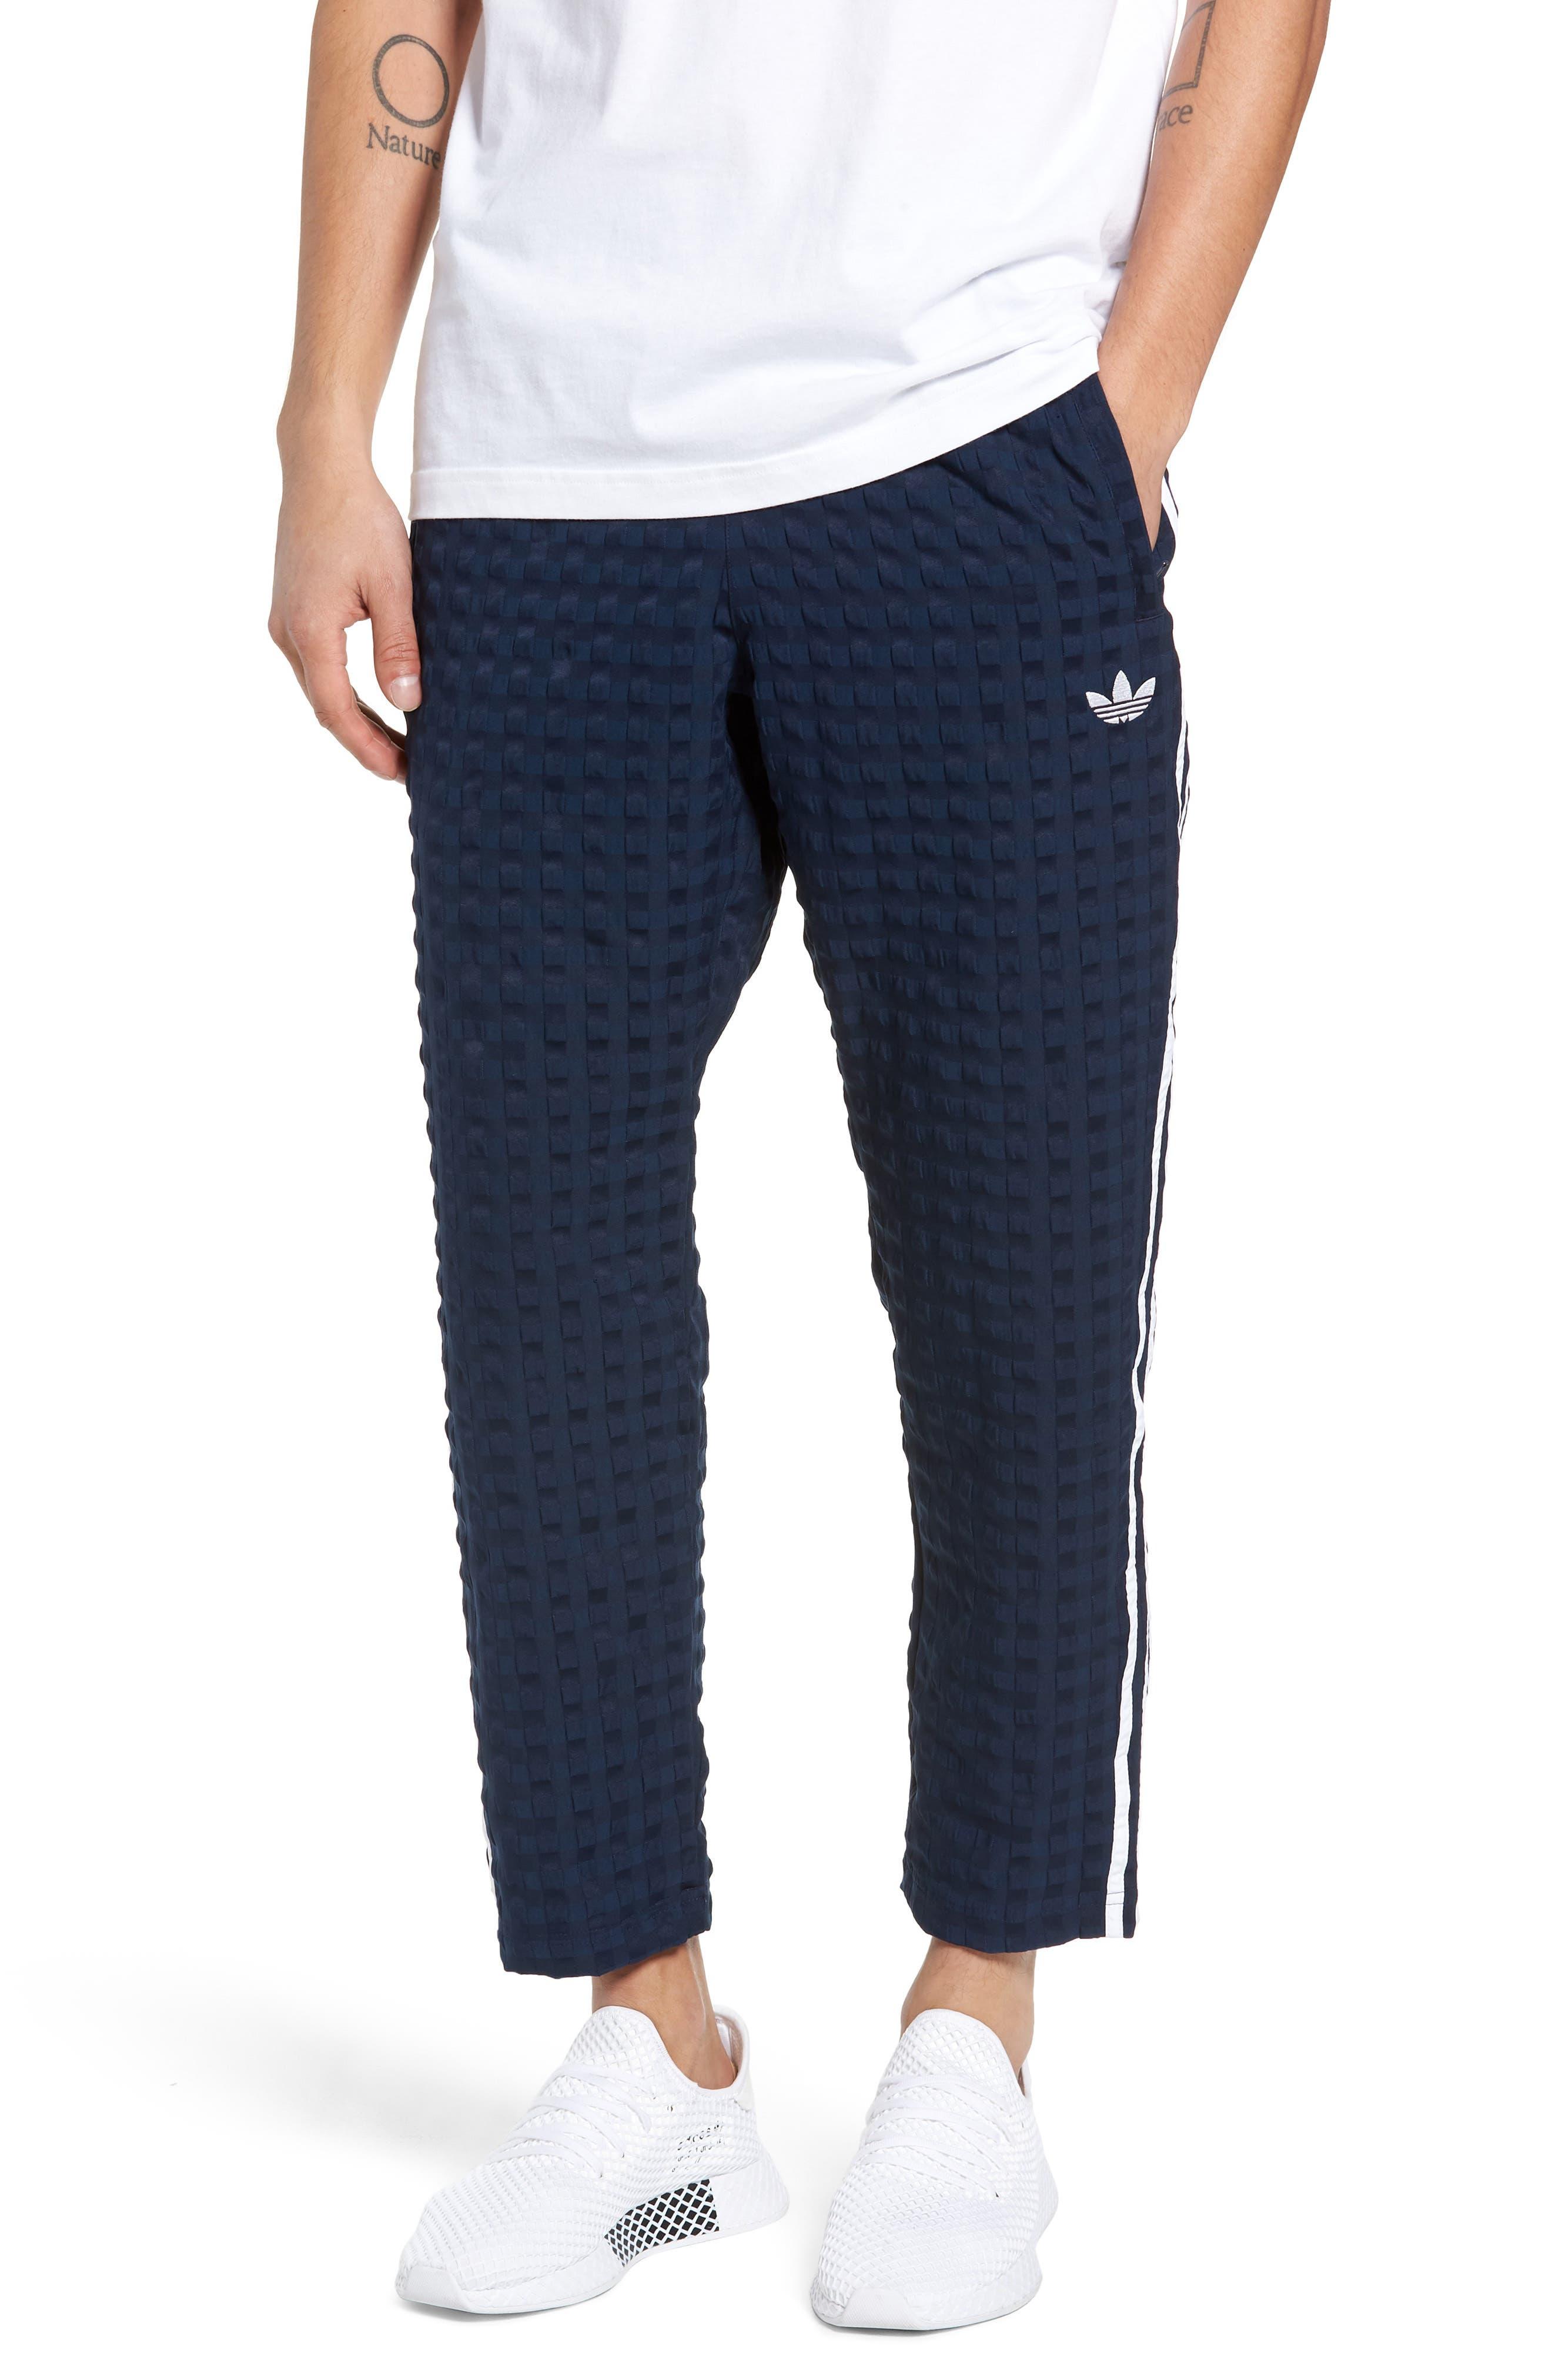 ADIDAS ORIGINALS Check Seersucker Track Pants, Main, color, COLLEGIATE NAVY